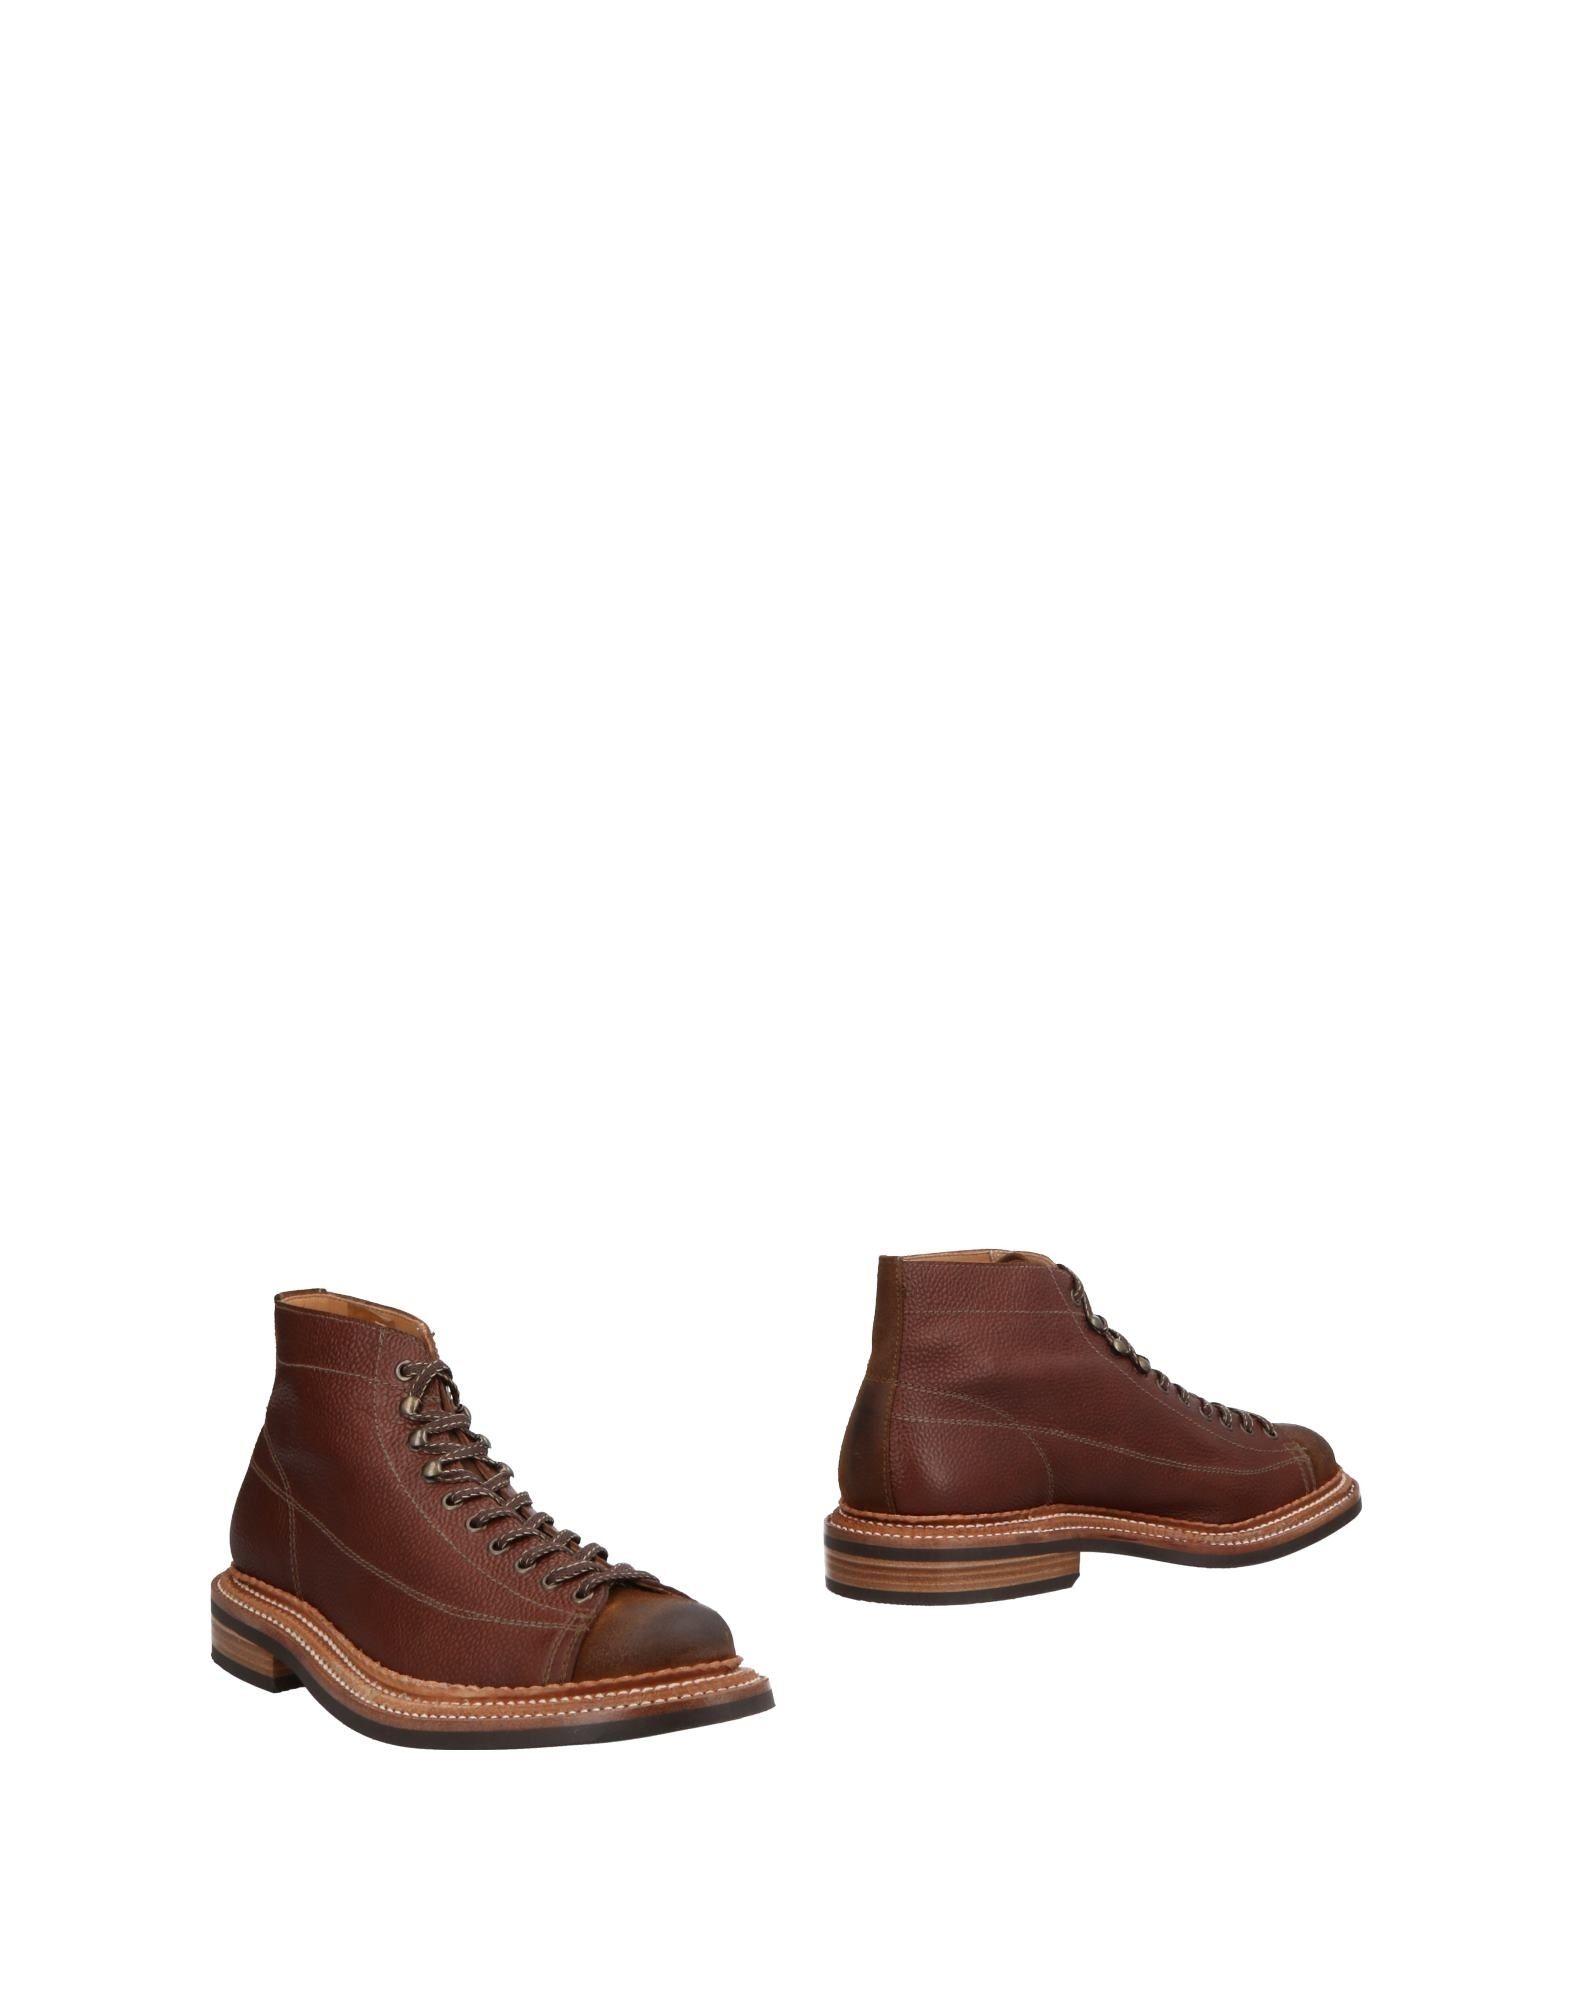 Grenson Boots - on Men Grenson Boots online on -  United Kingdom - 11505901DL b15e13